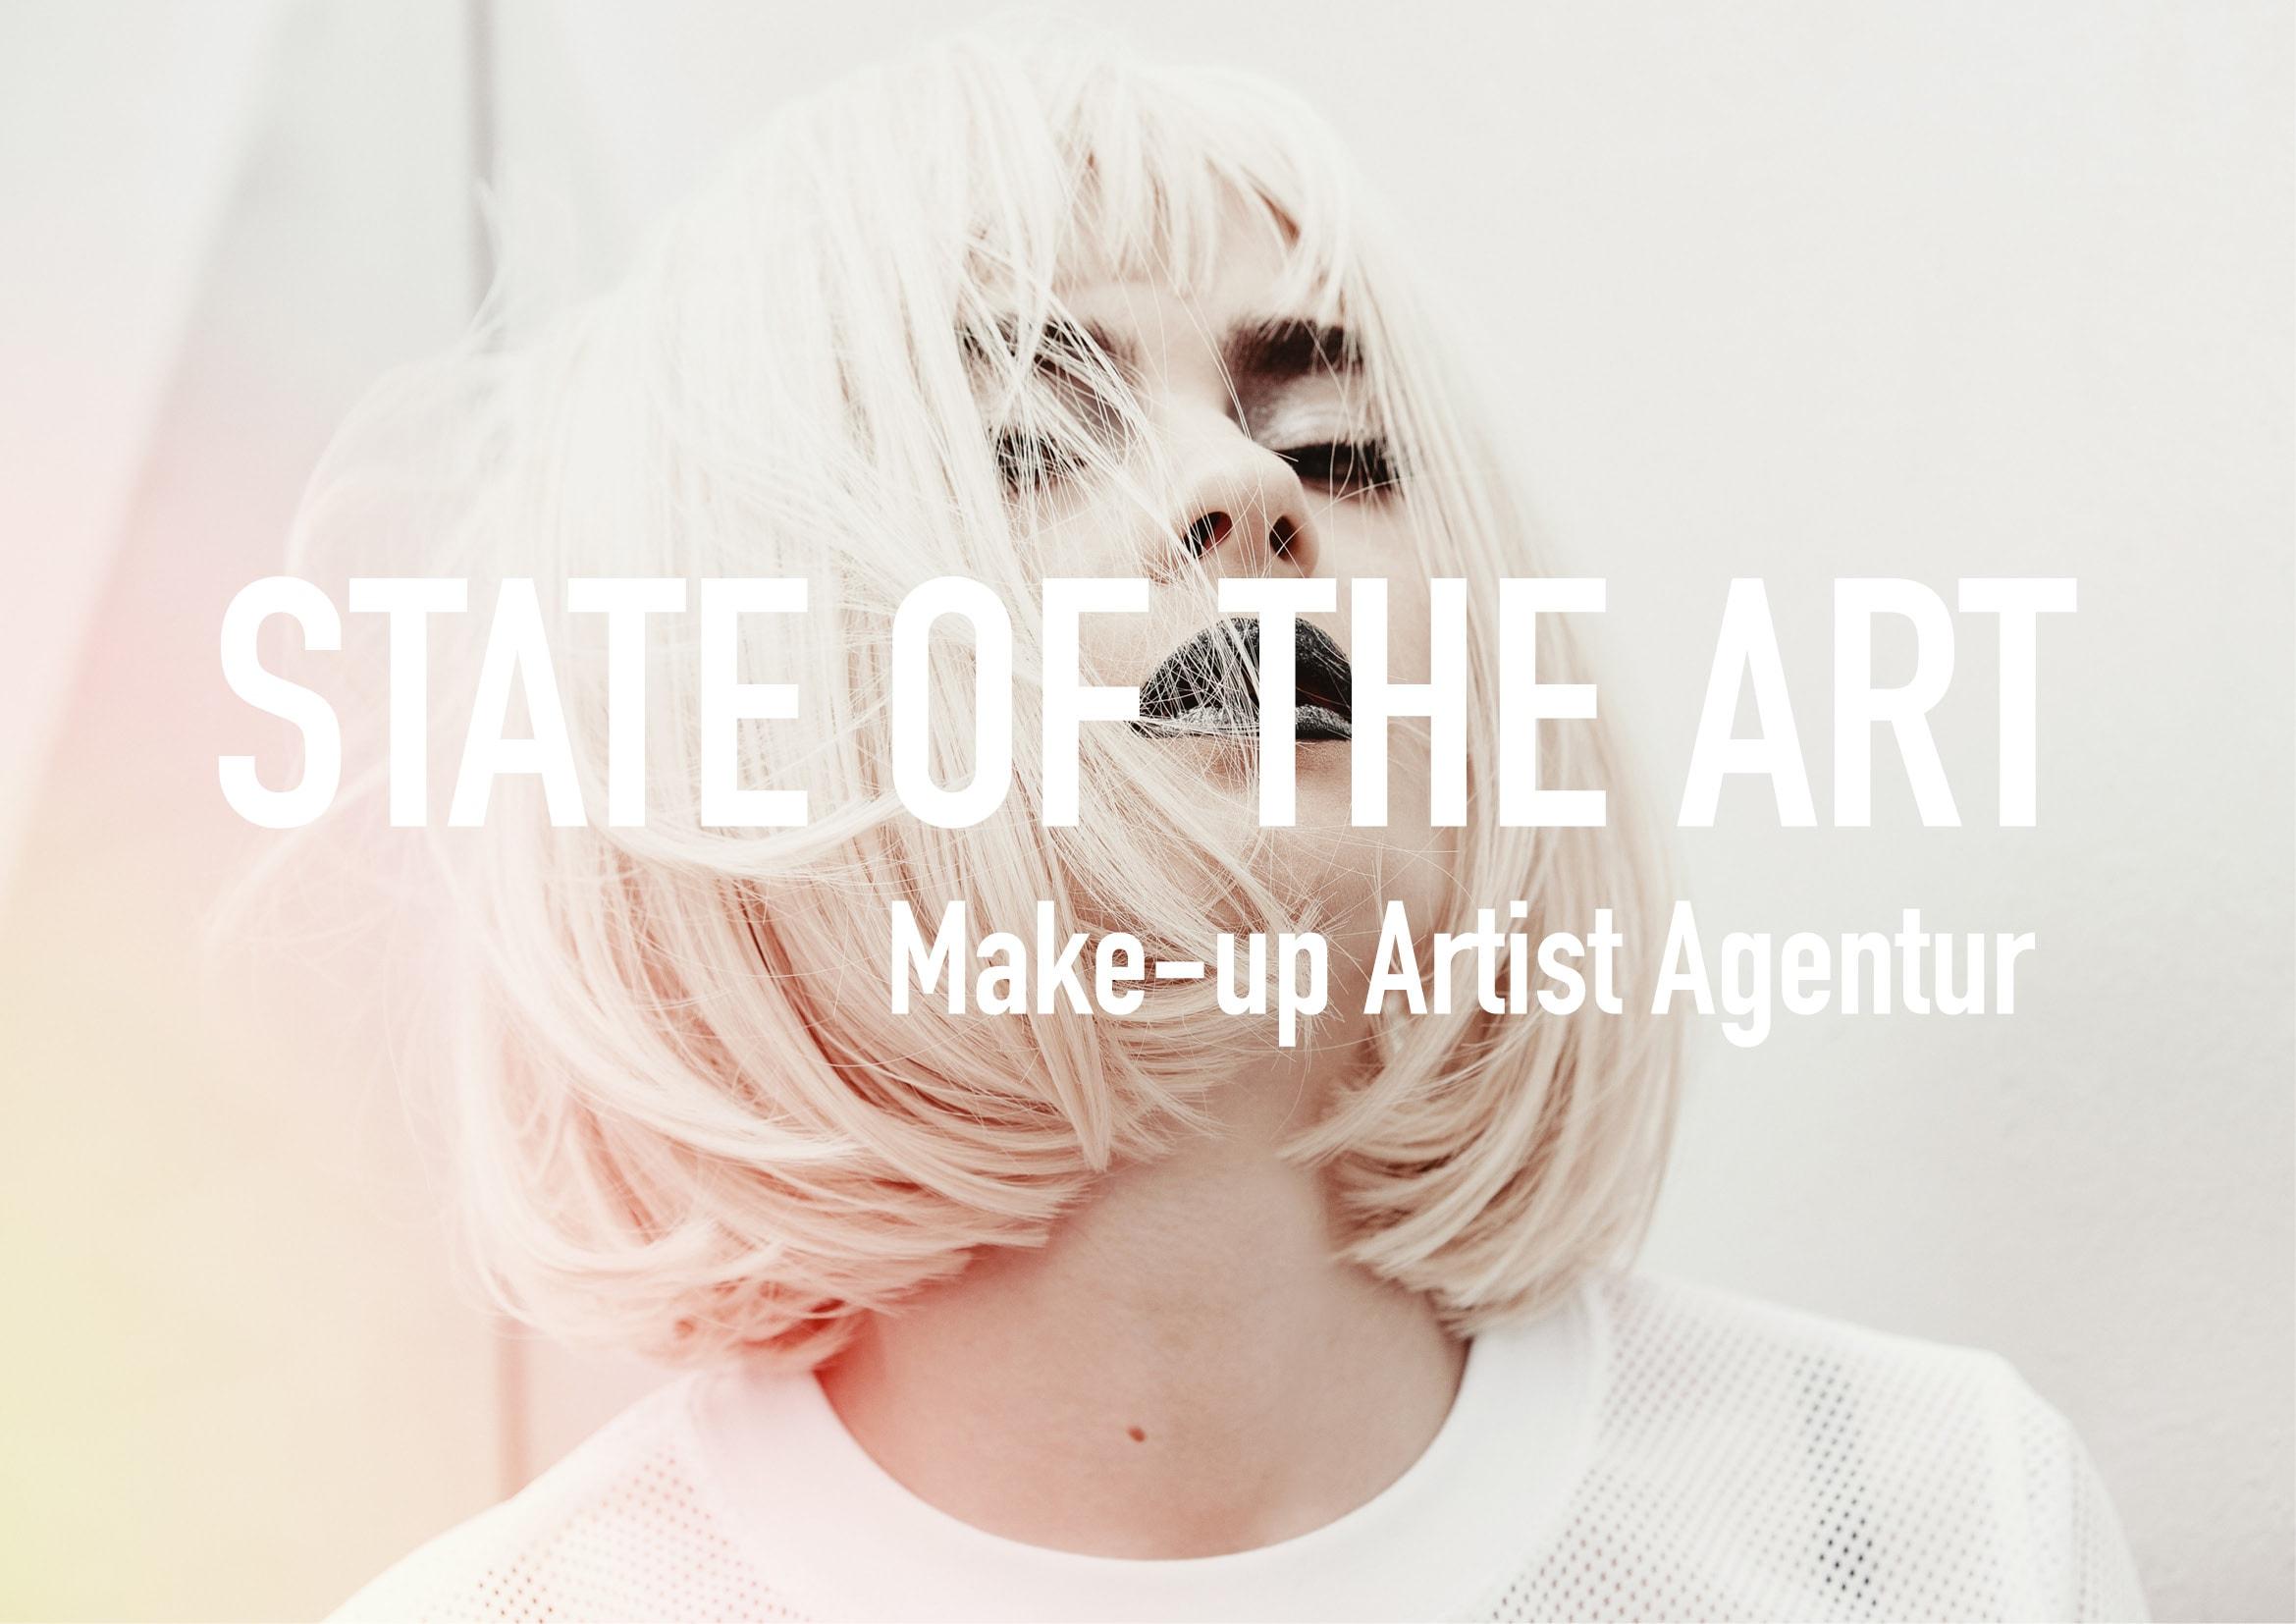 Webdesign Entwicklung Make-up Artist